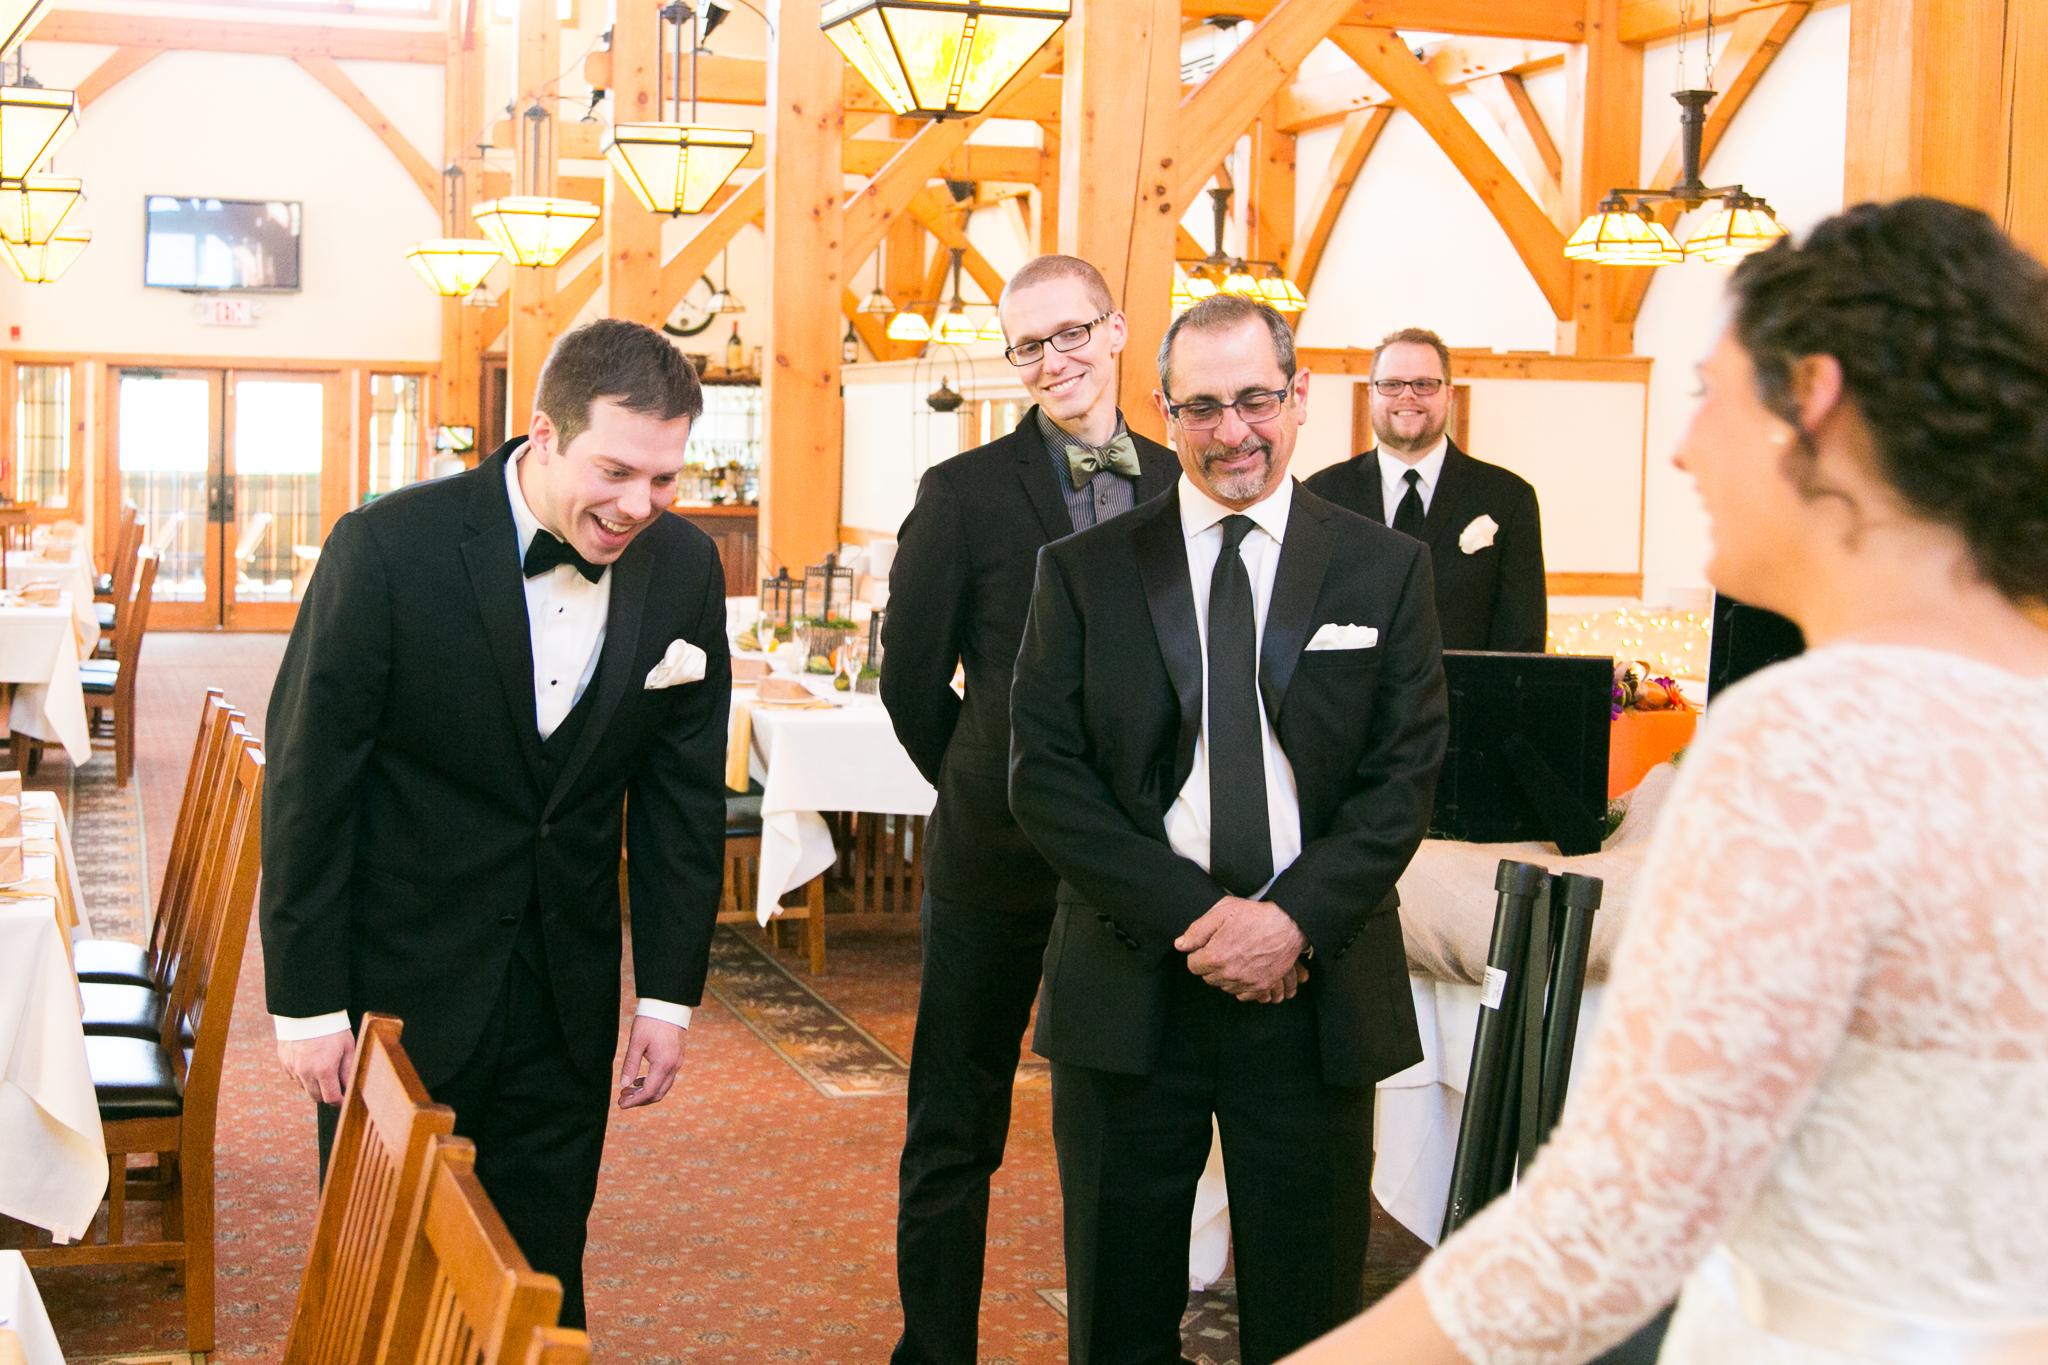 camuglia-whomstudio-chelsea_and_andy-nycphotographer-wedding-brooklyn-buffalo-timberlodge-013-5255.jpg